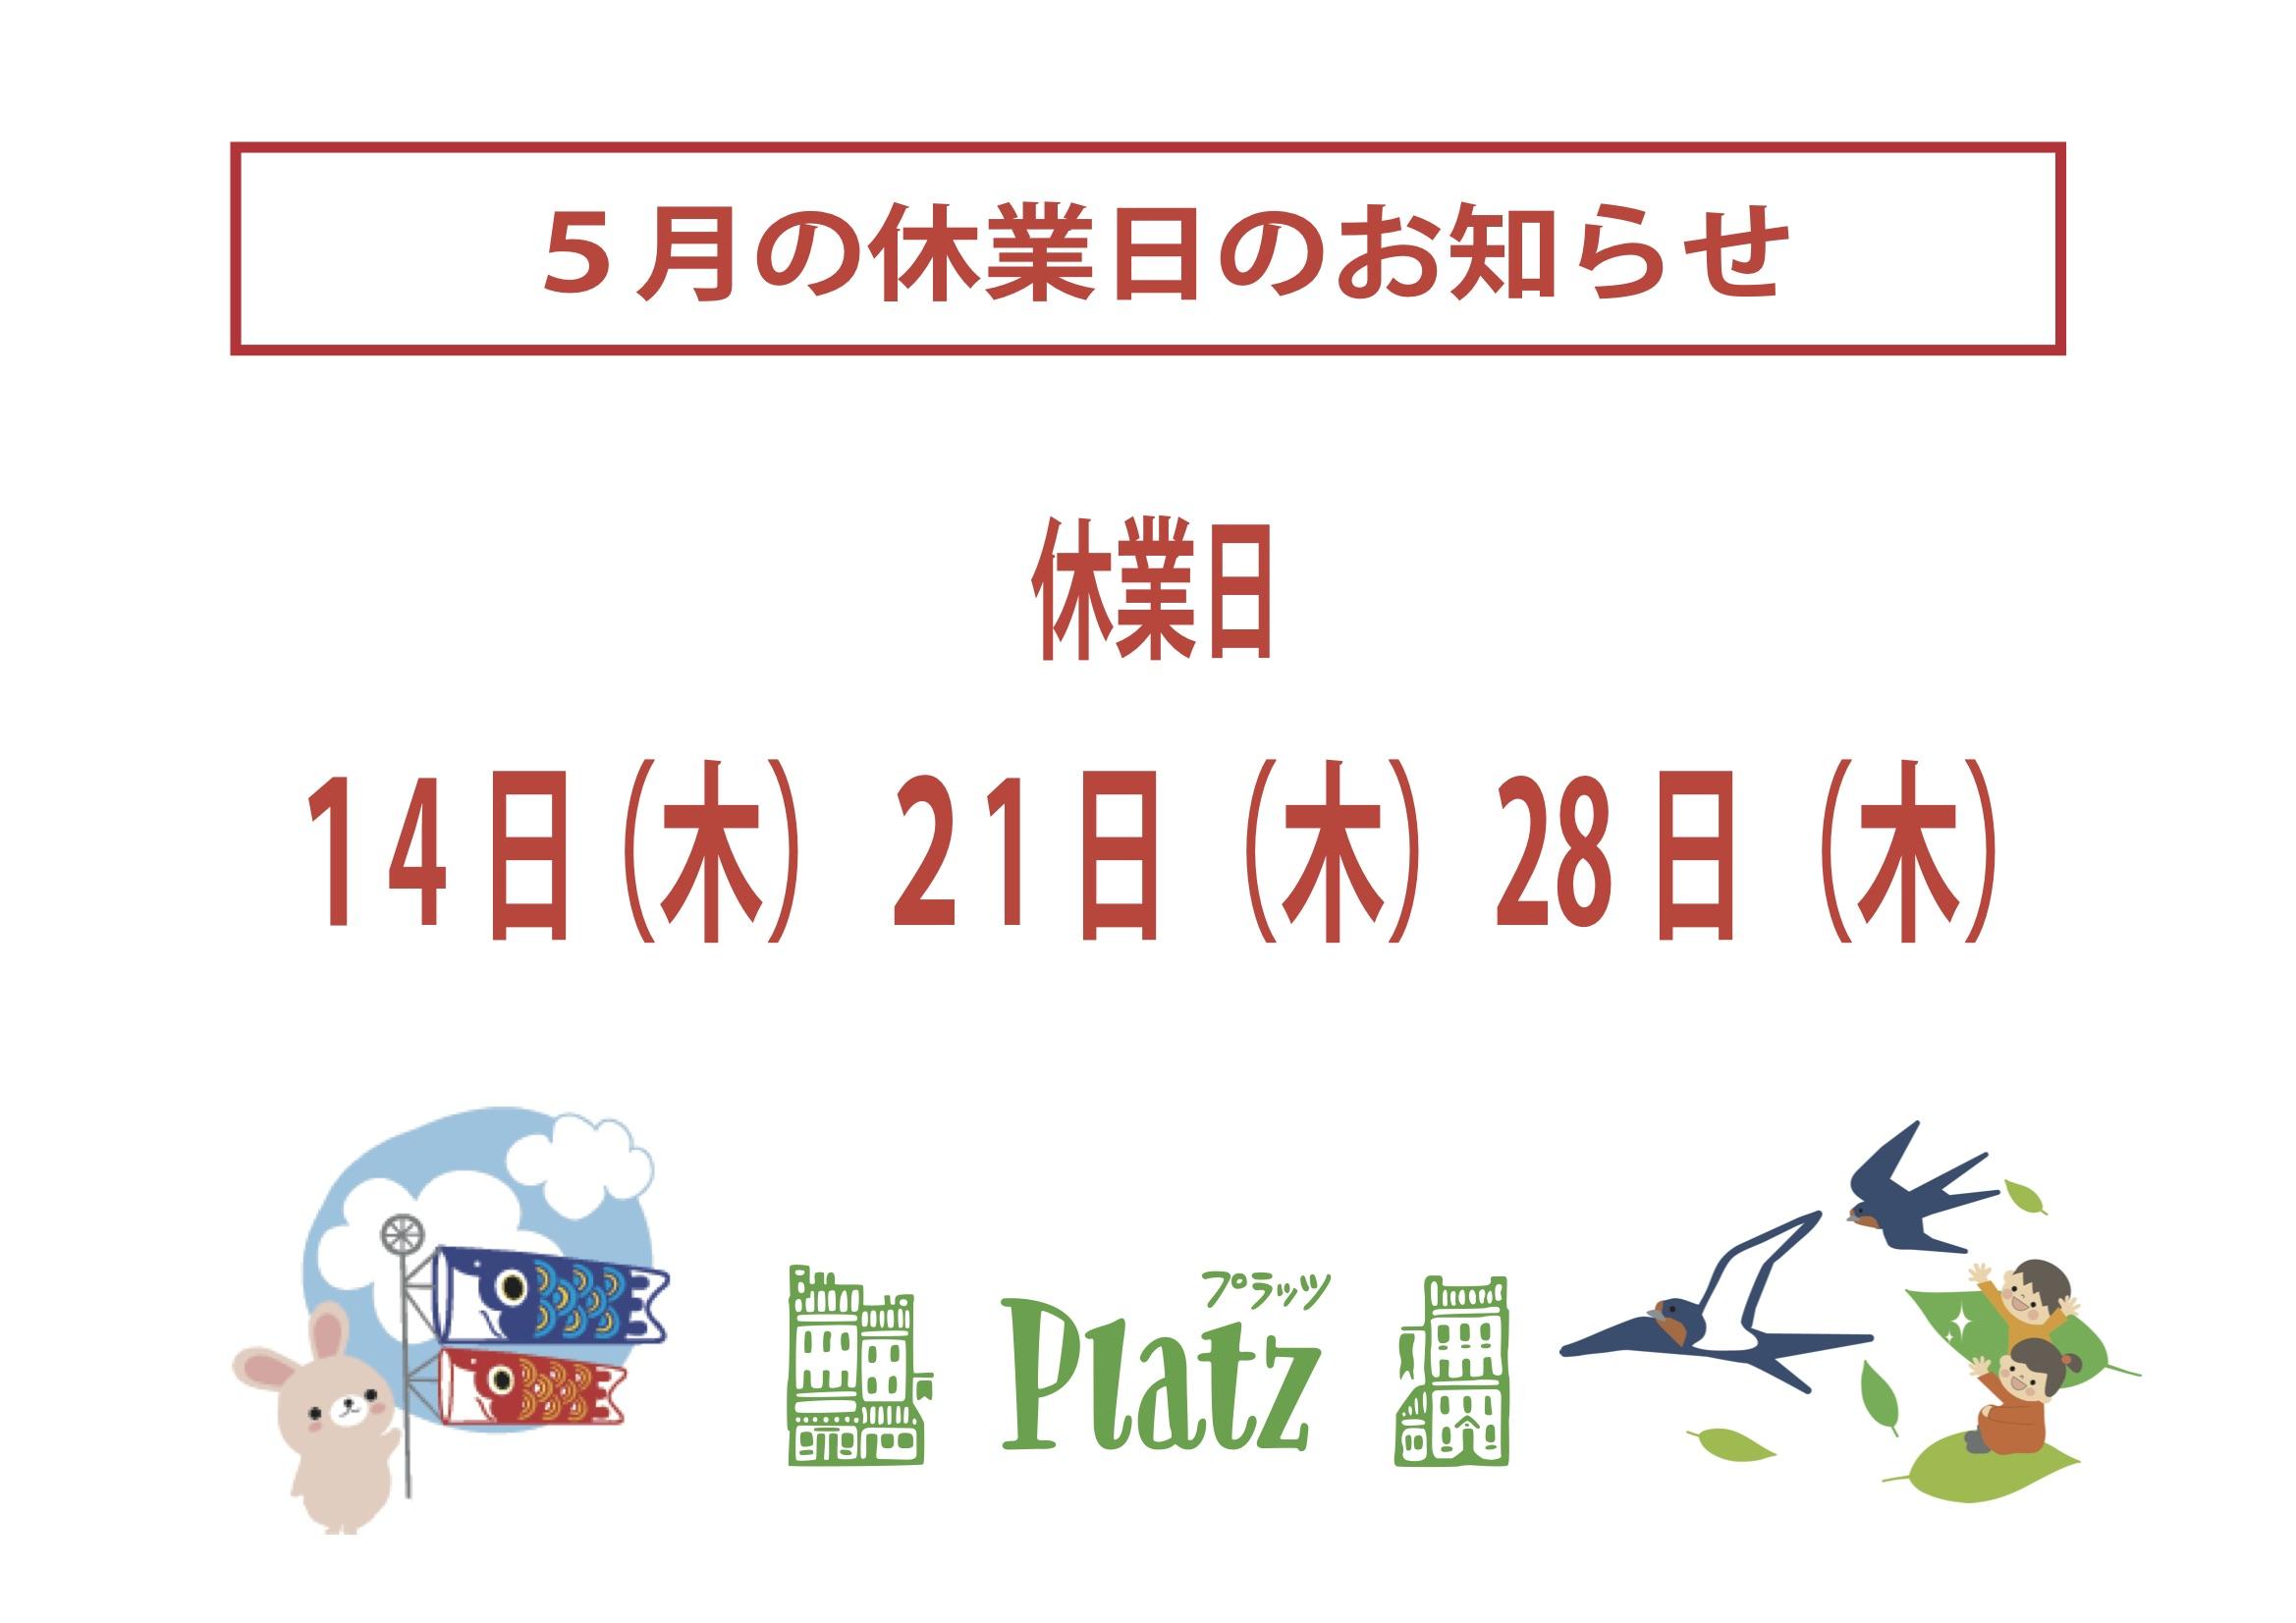 http://www.kyoto-platz.jp/news/images/2020.%EF%BC%95%E6%9C%88%E4%BC%91%E6%A5%AD%E6%97%A5.jpg